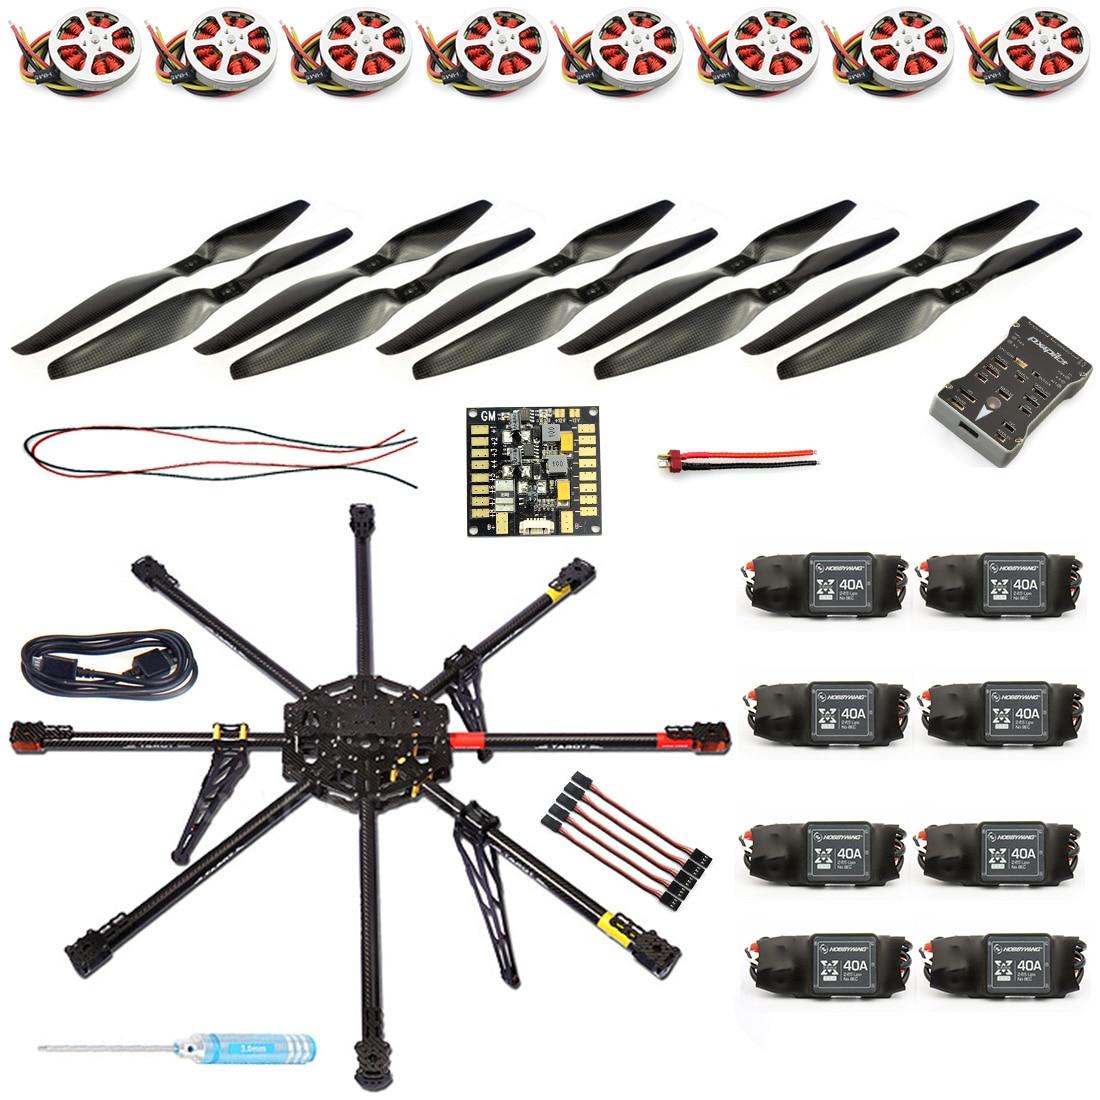 JMT DIY 8-Axle Unassembled RC Drone 1000mm Carbon Octocopter PX4 PIX M8N GPS RC Drone PNF Kit No Remote Battery FPV F04765-B gzlozone diy kit njw1194 remote volume conrol kit treble